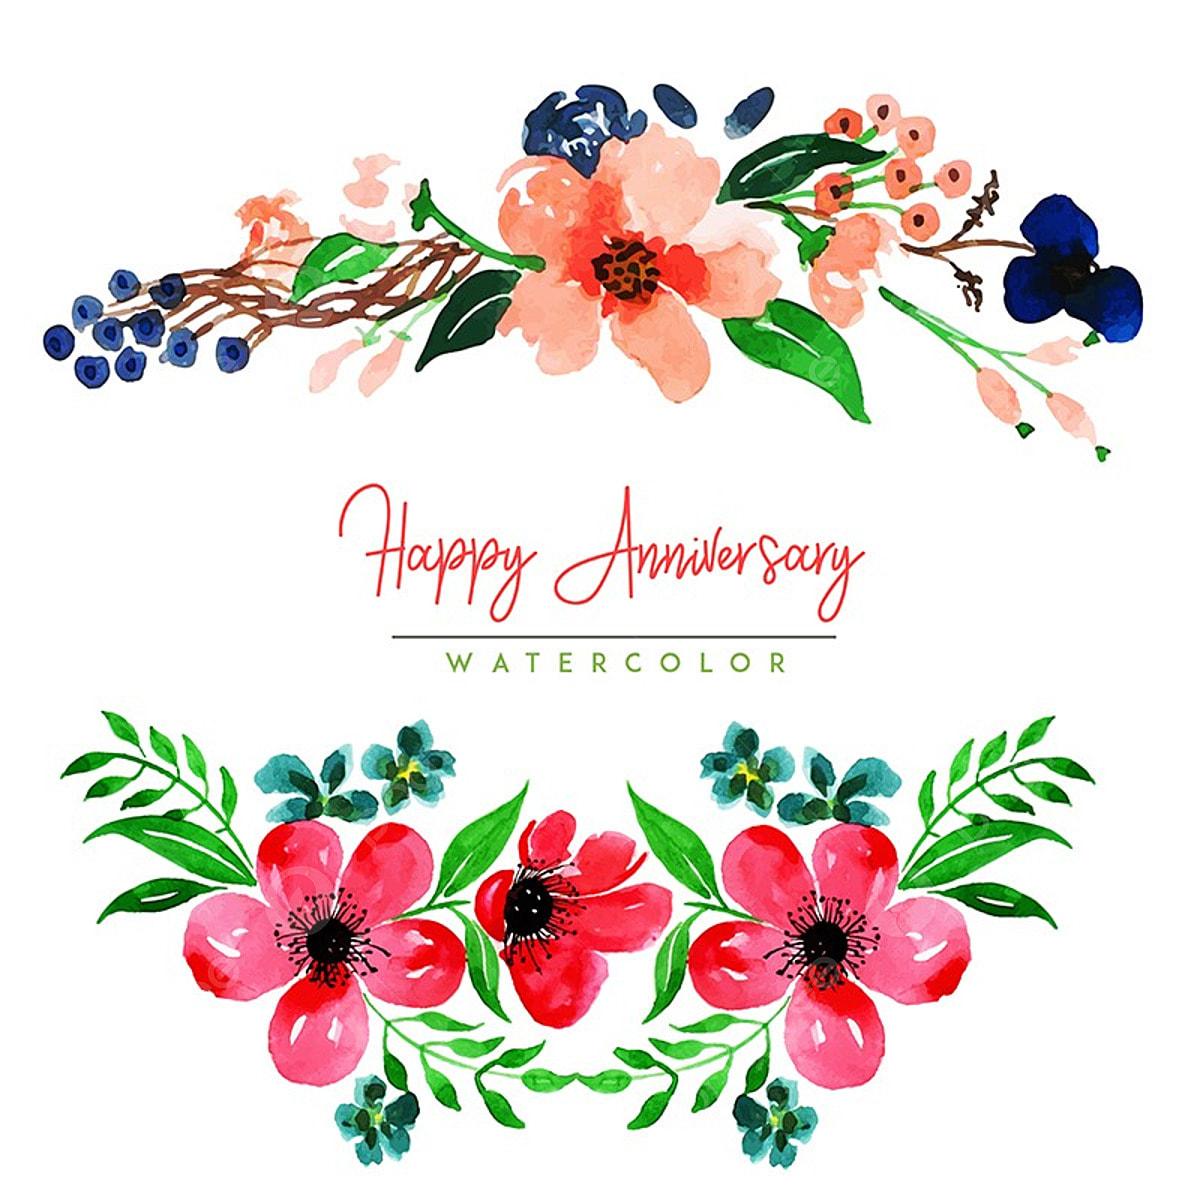 Watercolor Floral Happy Anniversary Background, Watercolor